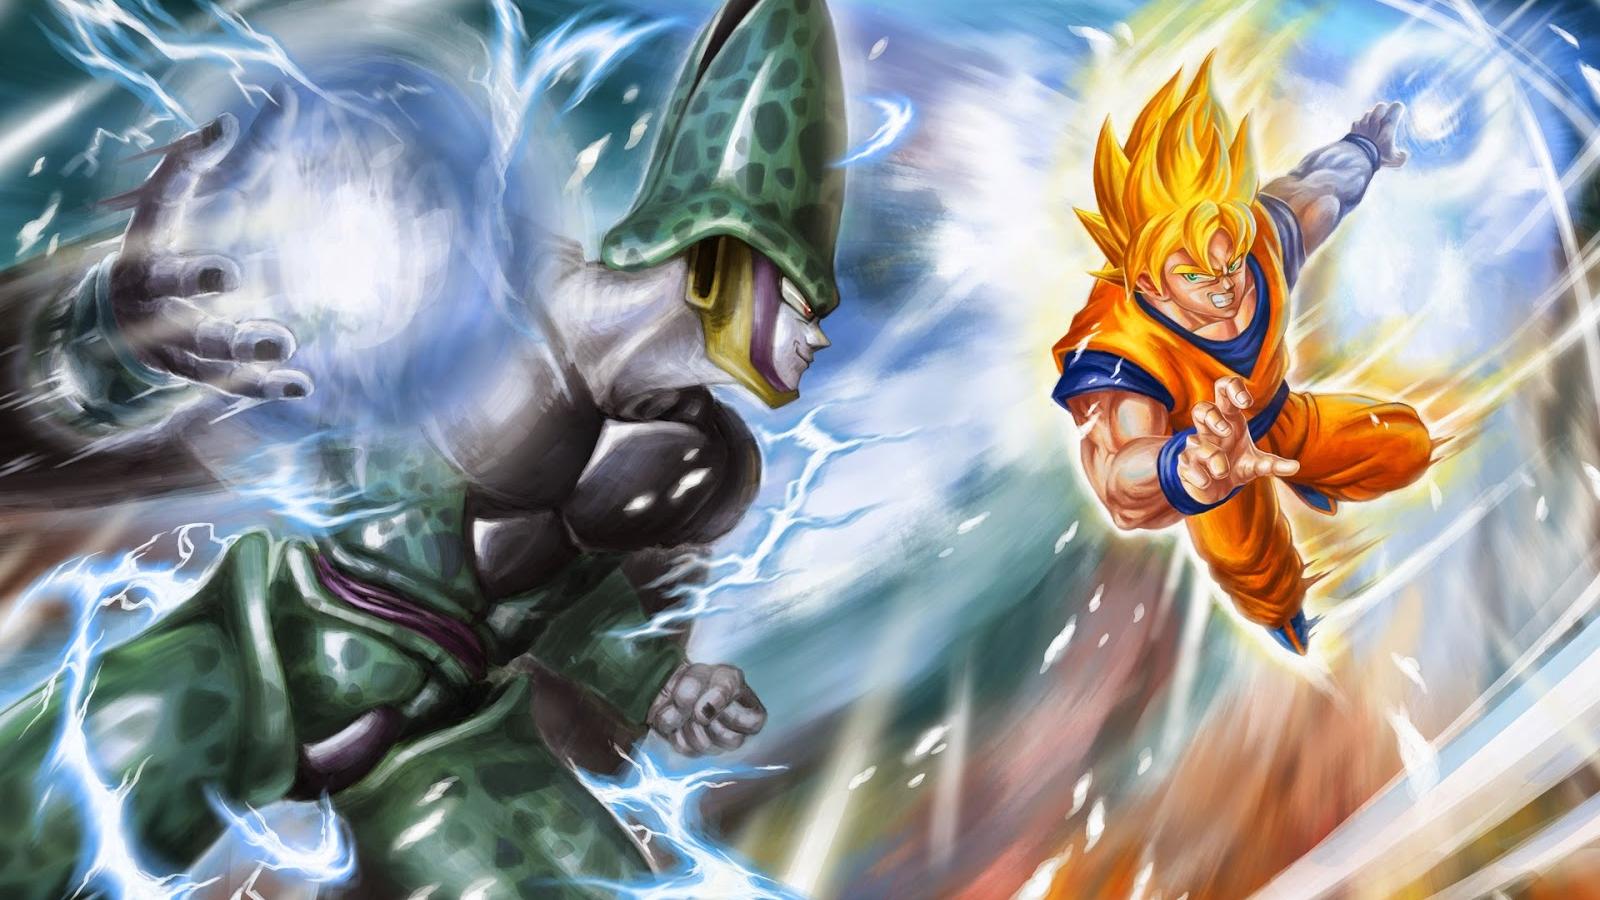 Free Download Goku Vs Cell Dragon Ball Z Fondos De Pantalla Hd